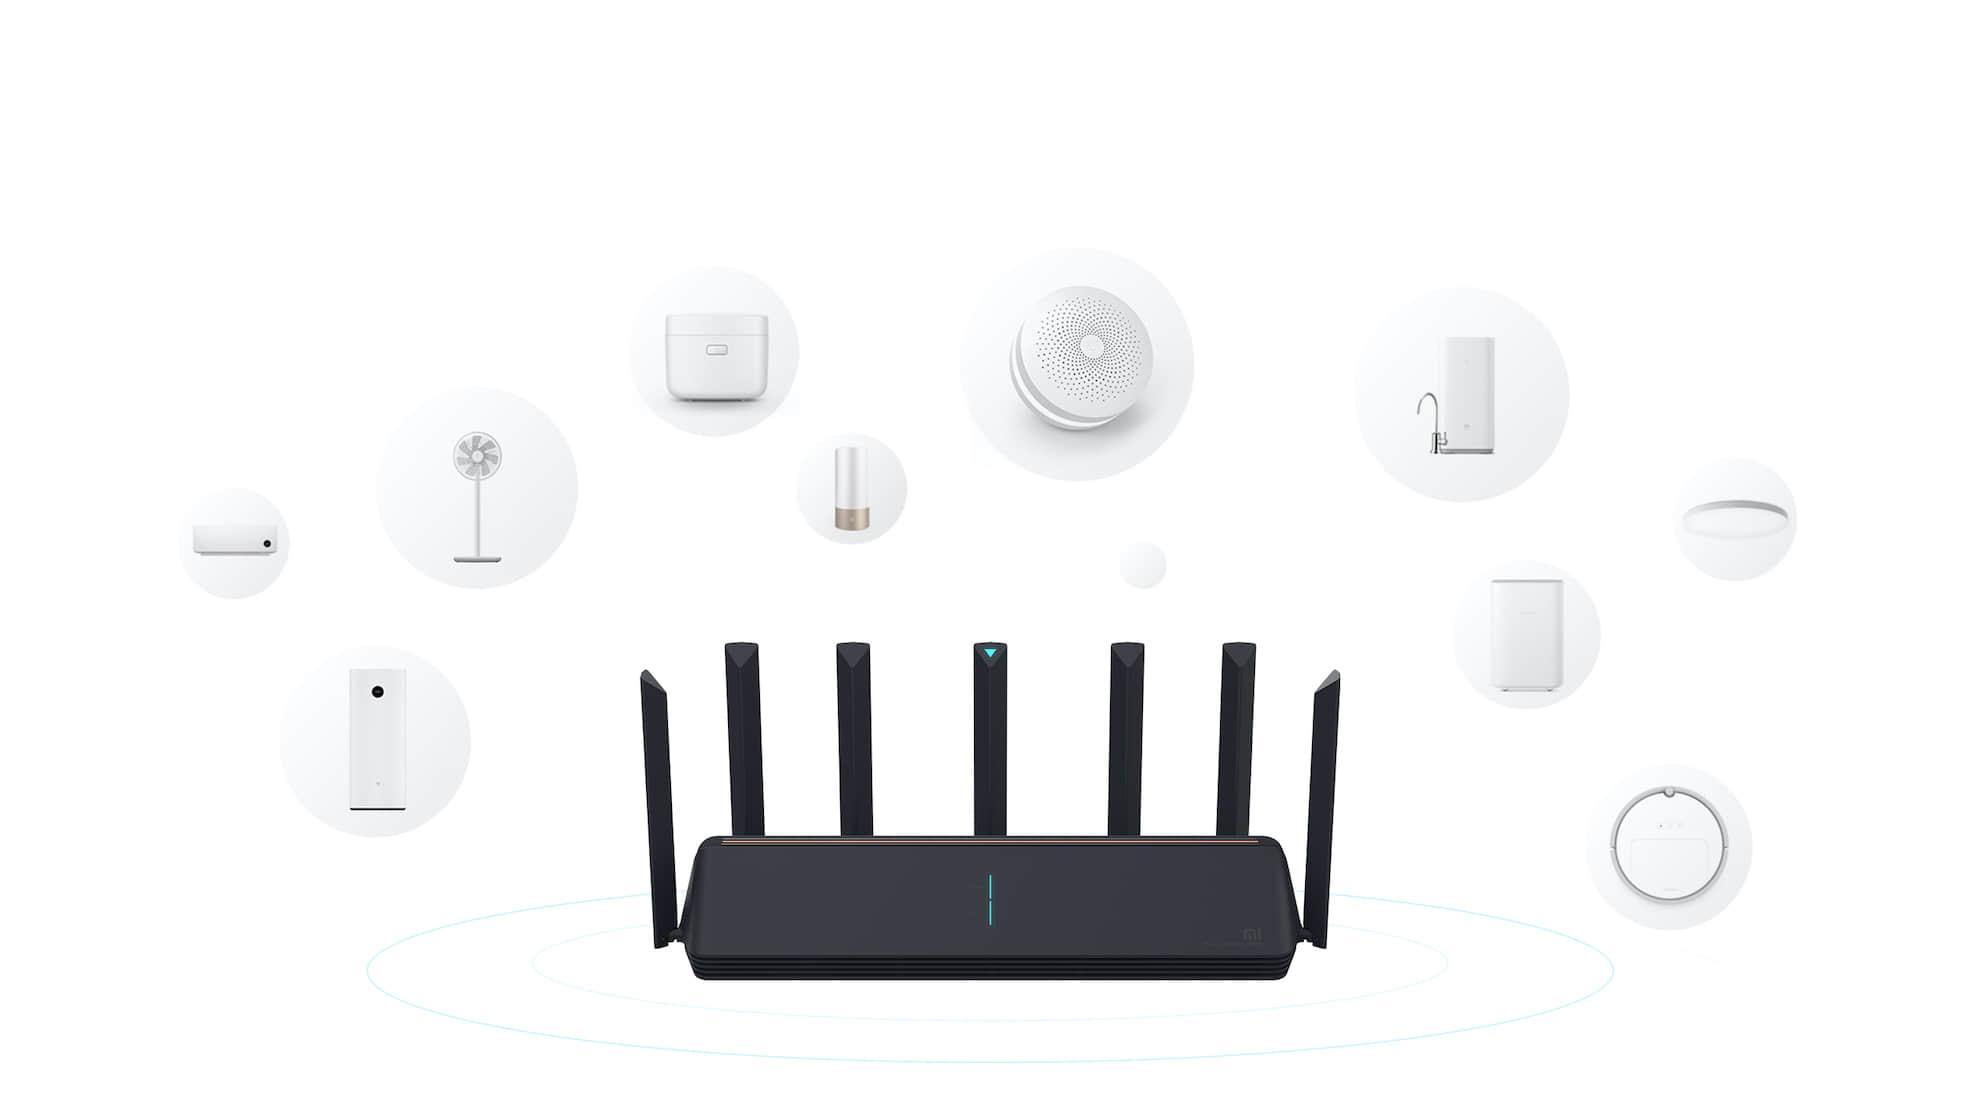 WirelessLink.net |小米AX3600 AP模式设置